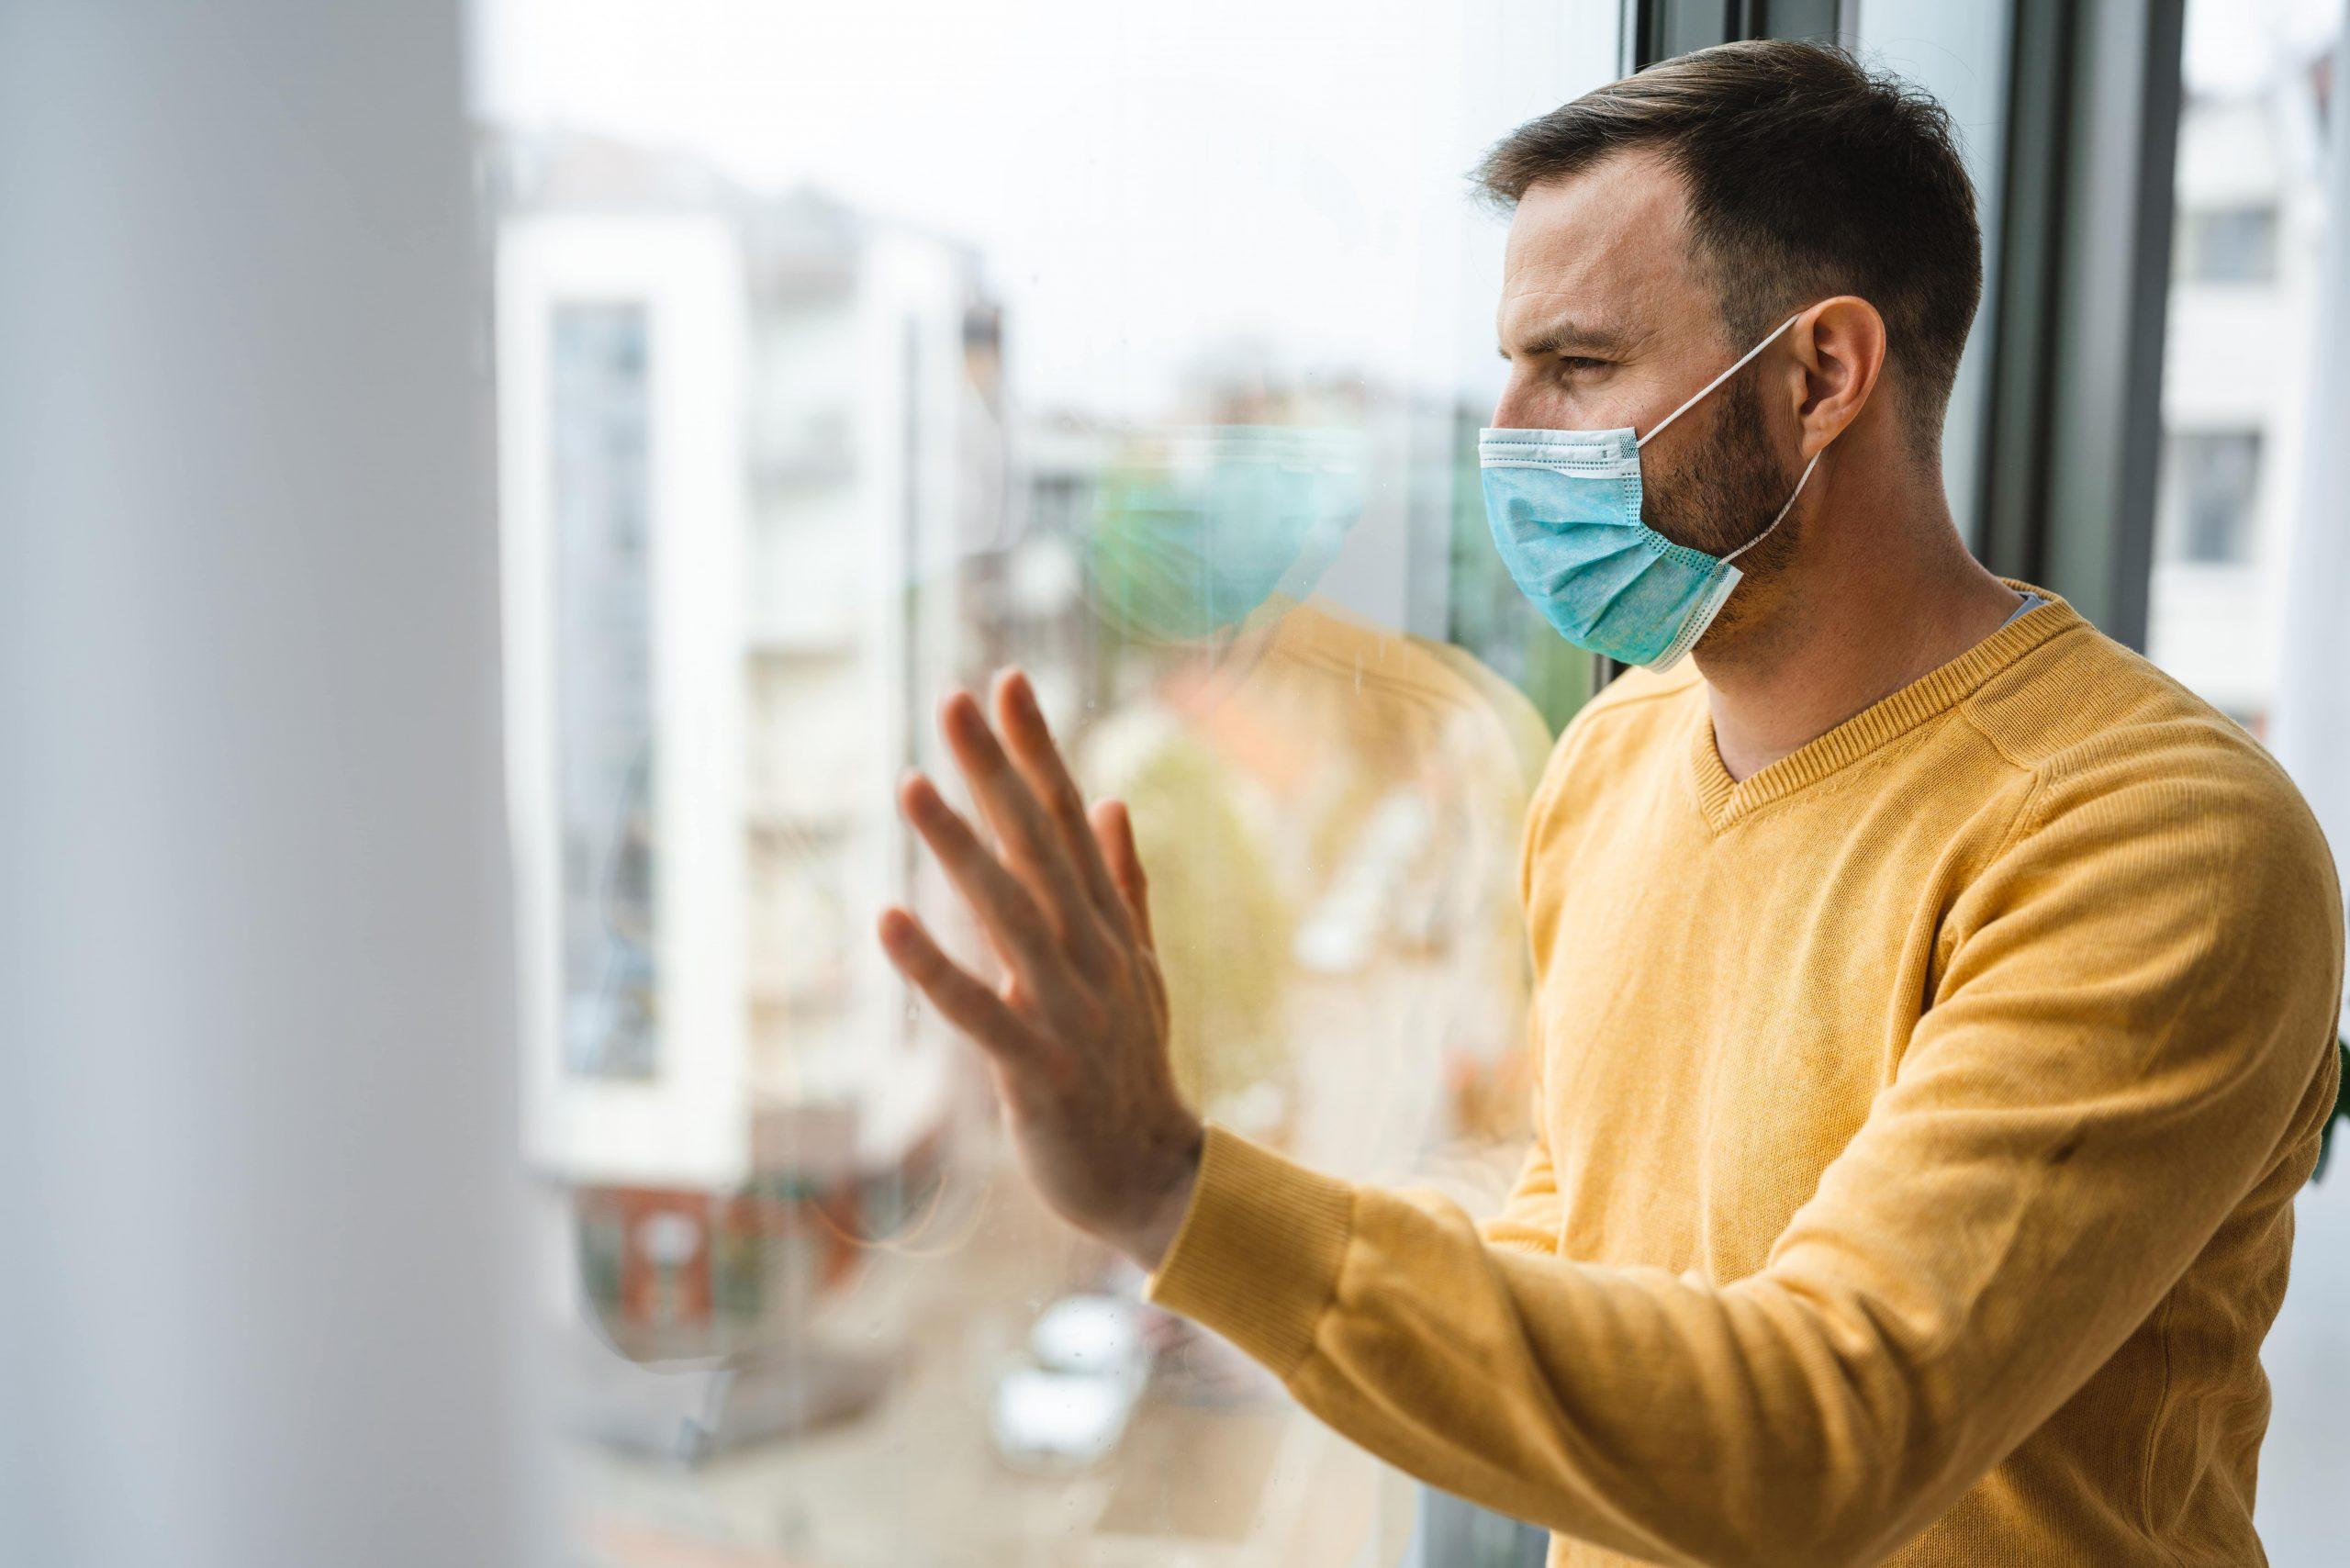 man-with-mask-to-protect-him-from-coronavirus-quar-ZUUTPPH-min